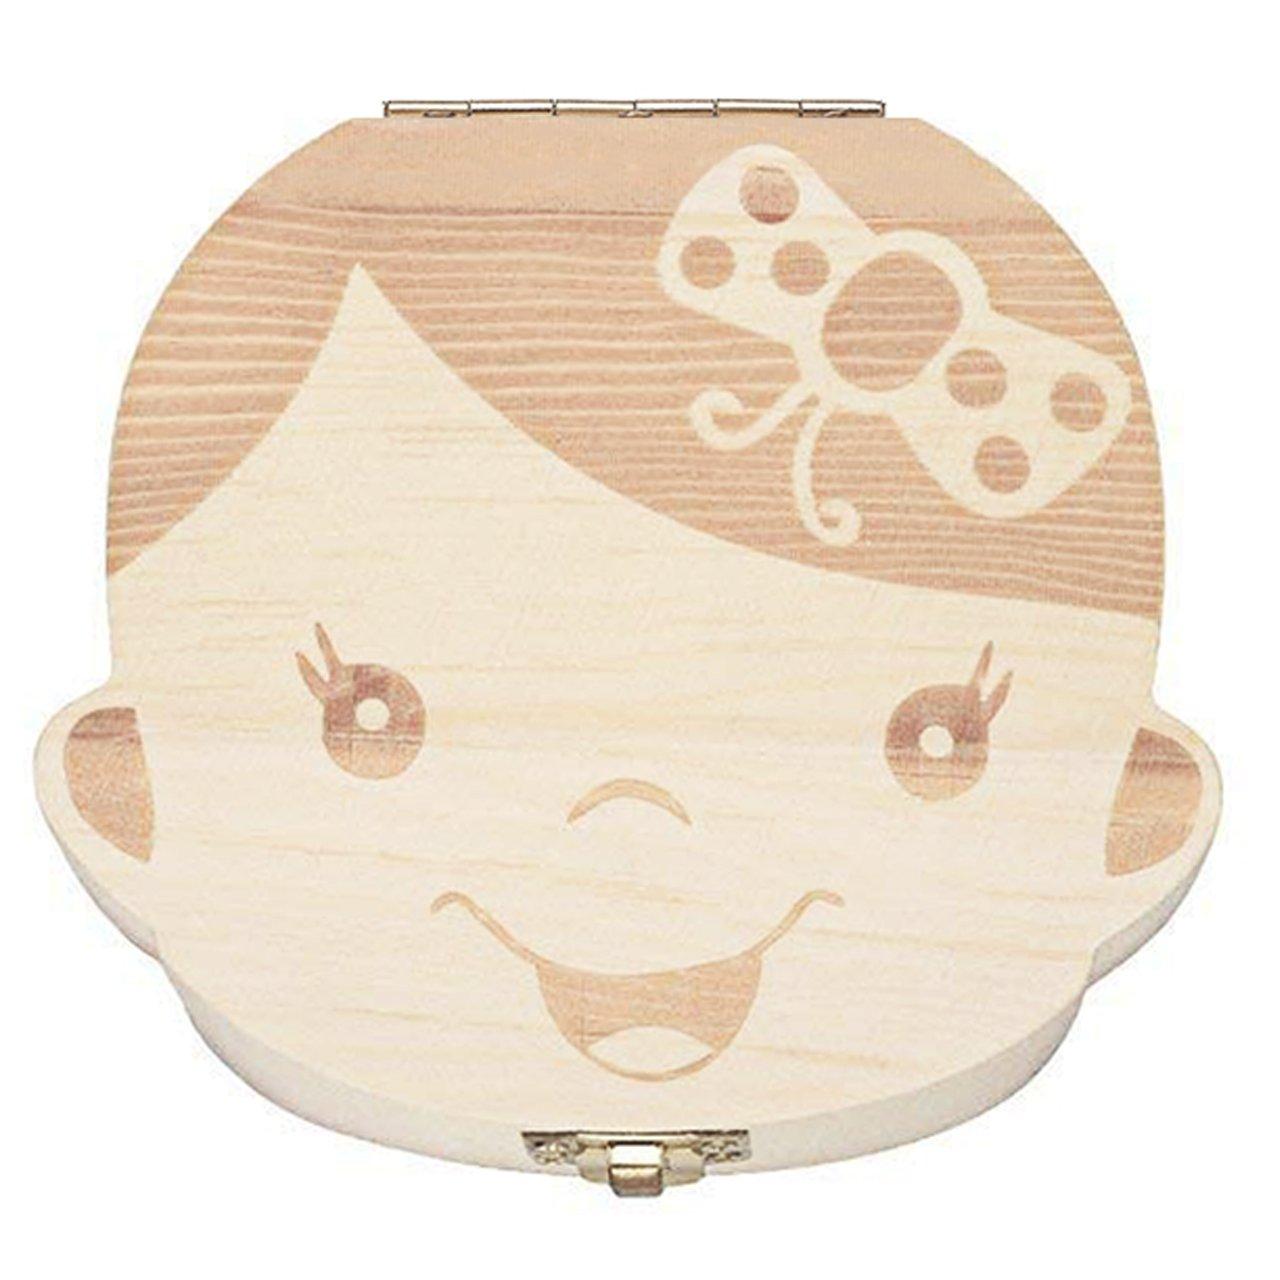 Mogoko Baby Girl Teeth Save Boxes Wooden Deciduous Souvenir Box Girl, Spanish; Customized Personalized Name Engraved Baby Child Tooth Keepsake Holder Organizer